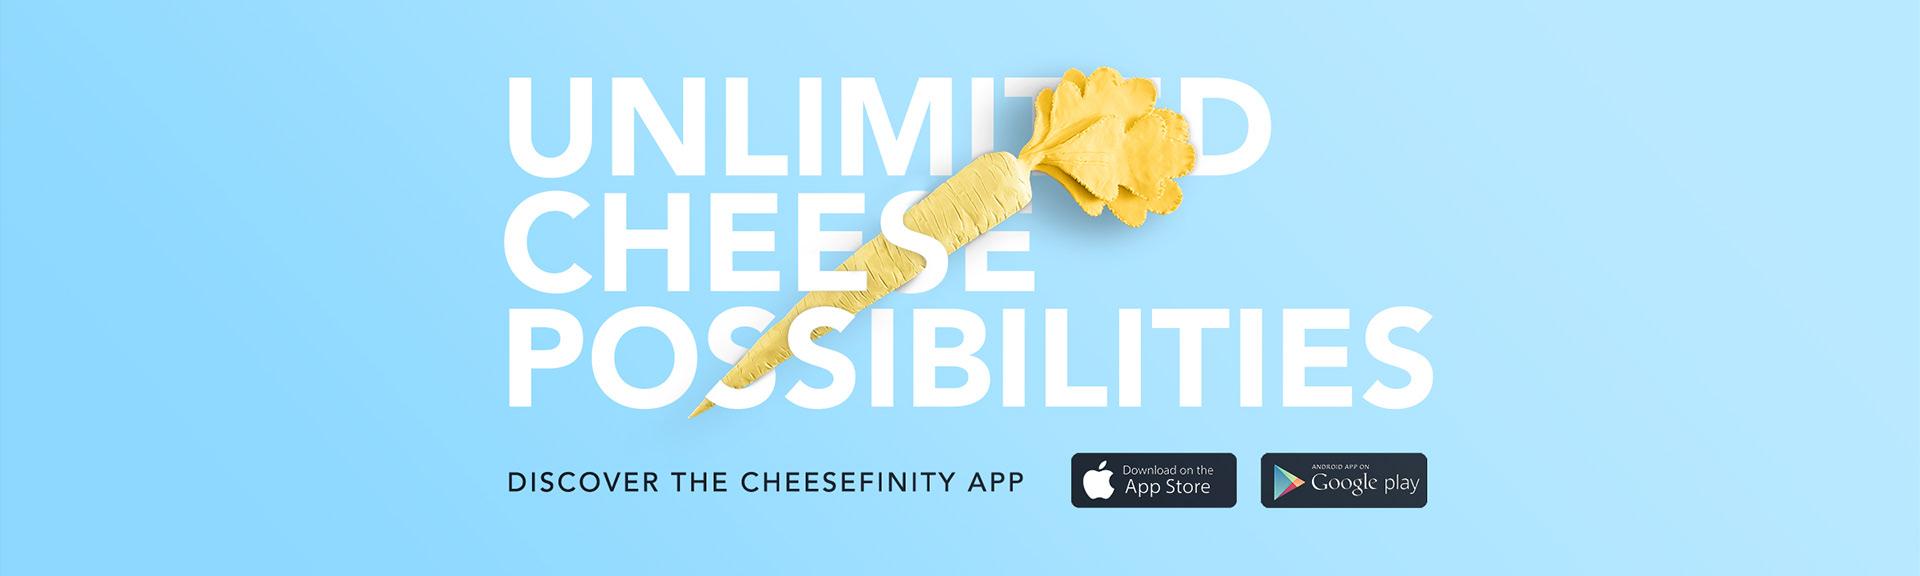 cheese banner.jpg